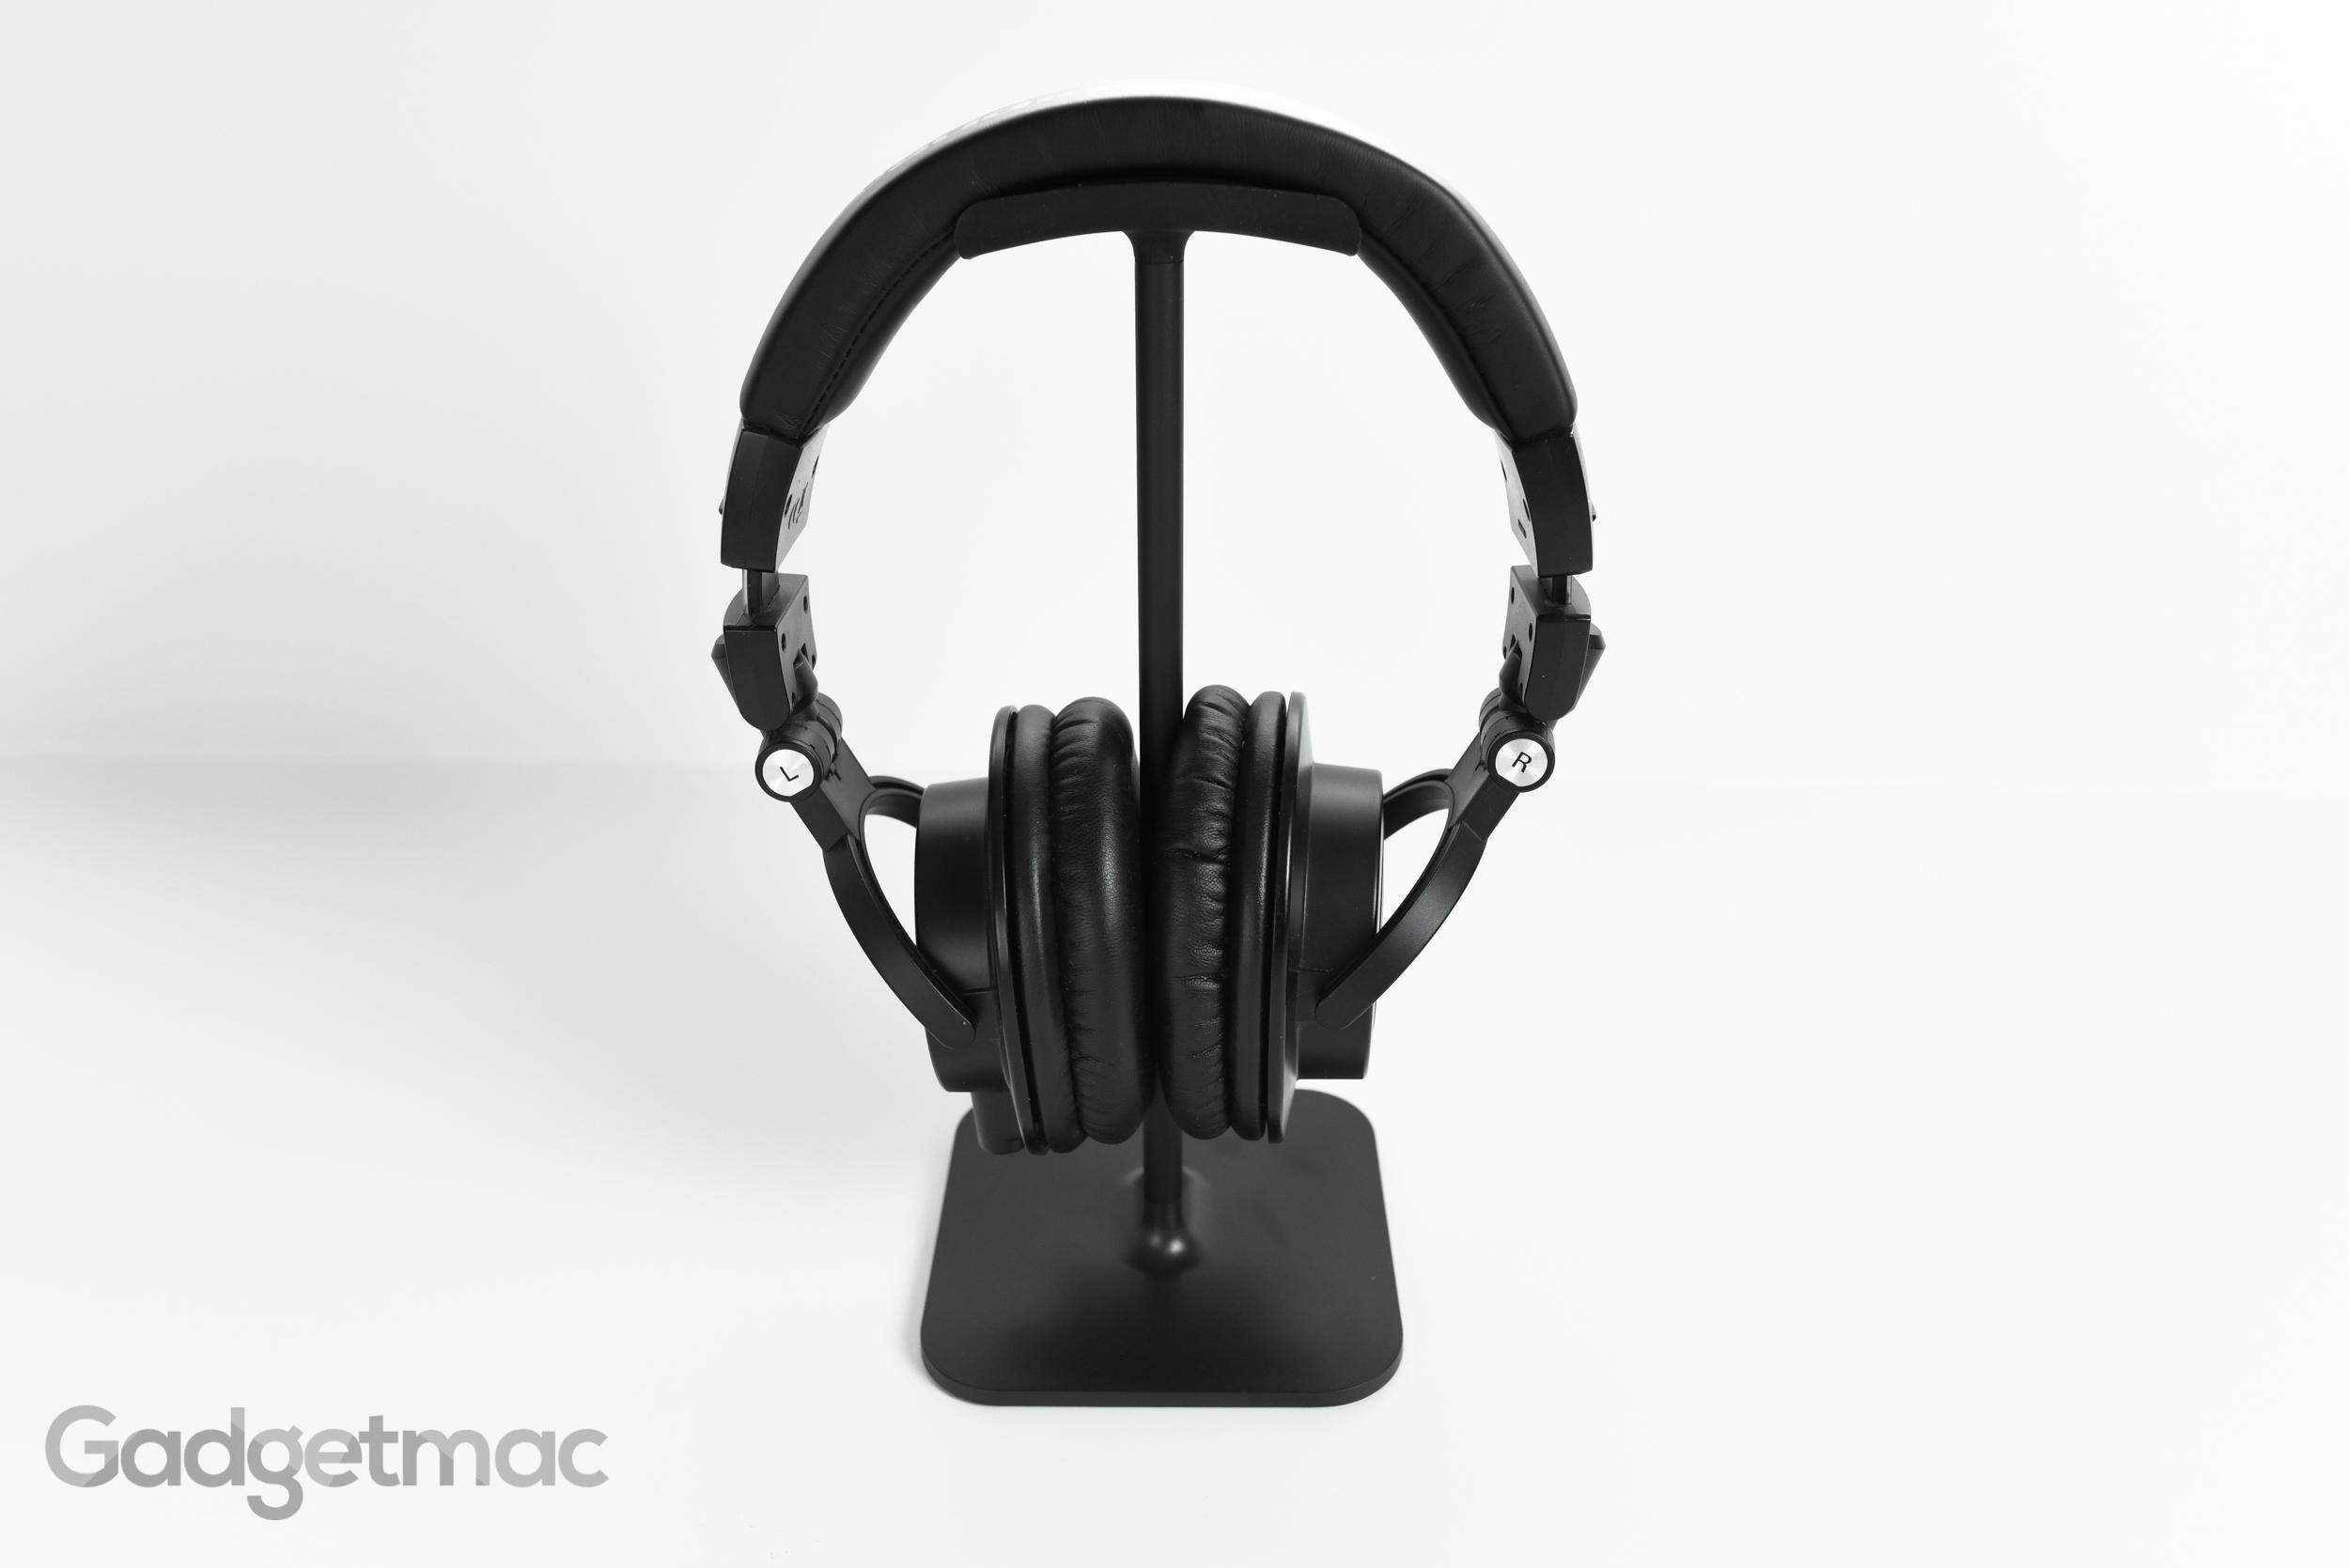 bluelounge_posto_headphone_stand_clamping.jpg